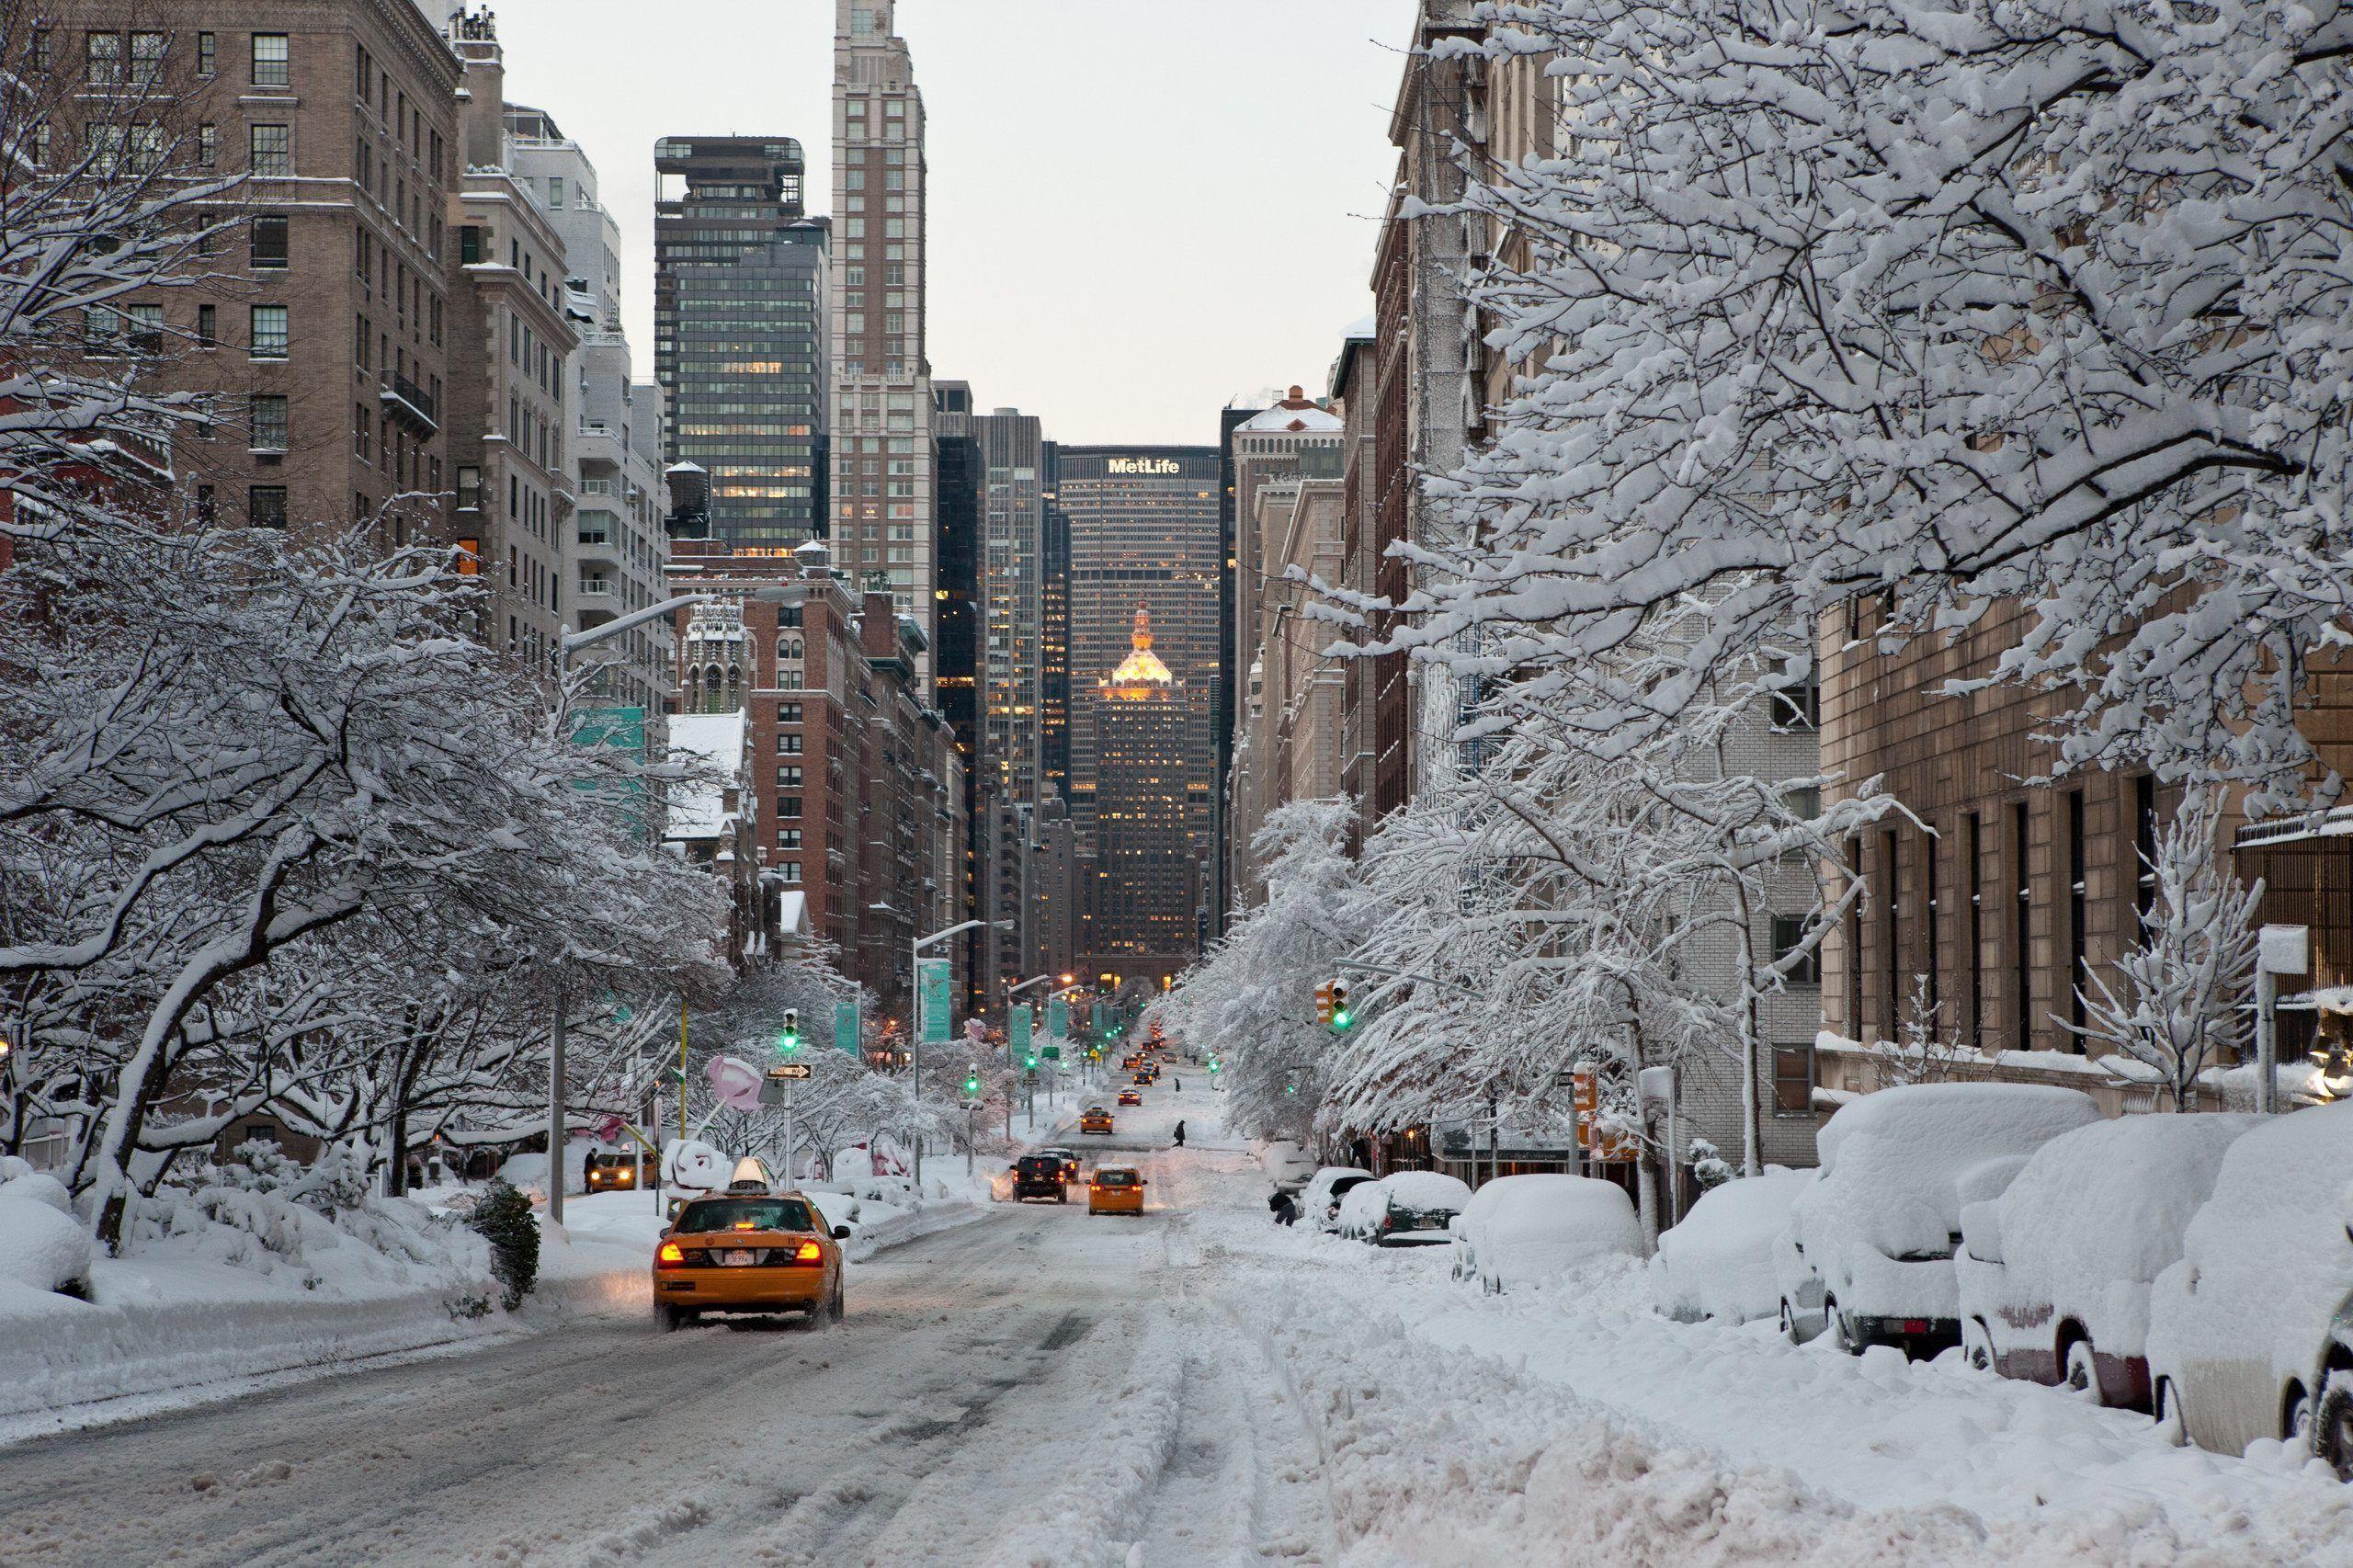 New York In Winter New York Snow Winter City New York Winter